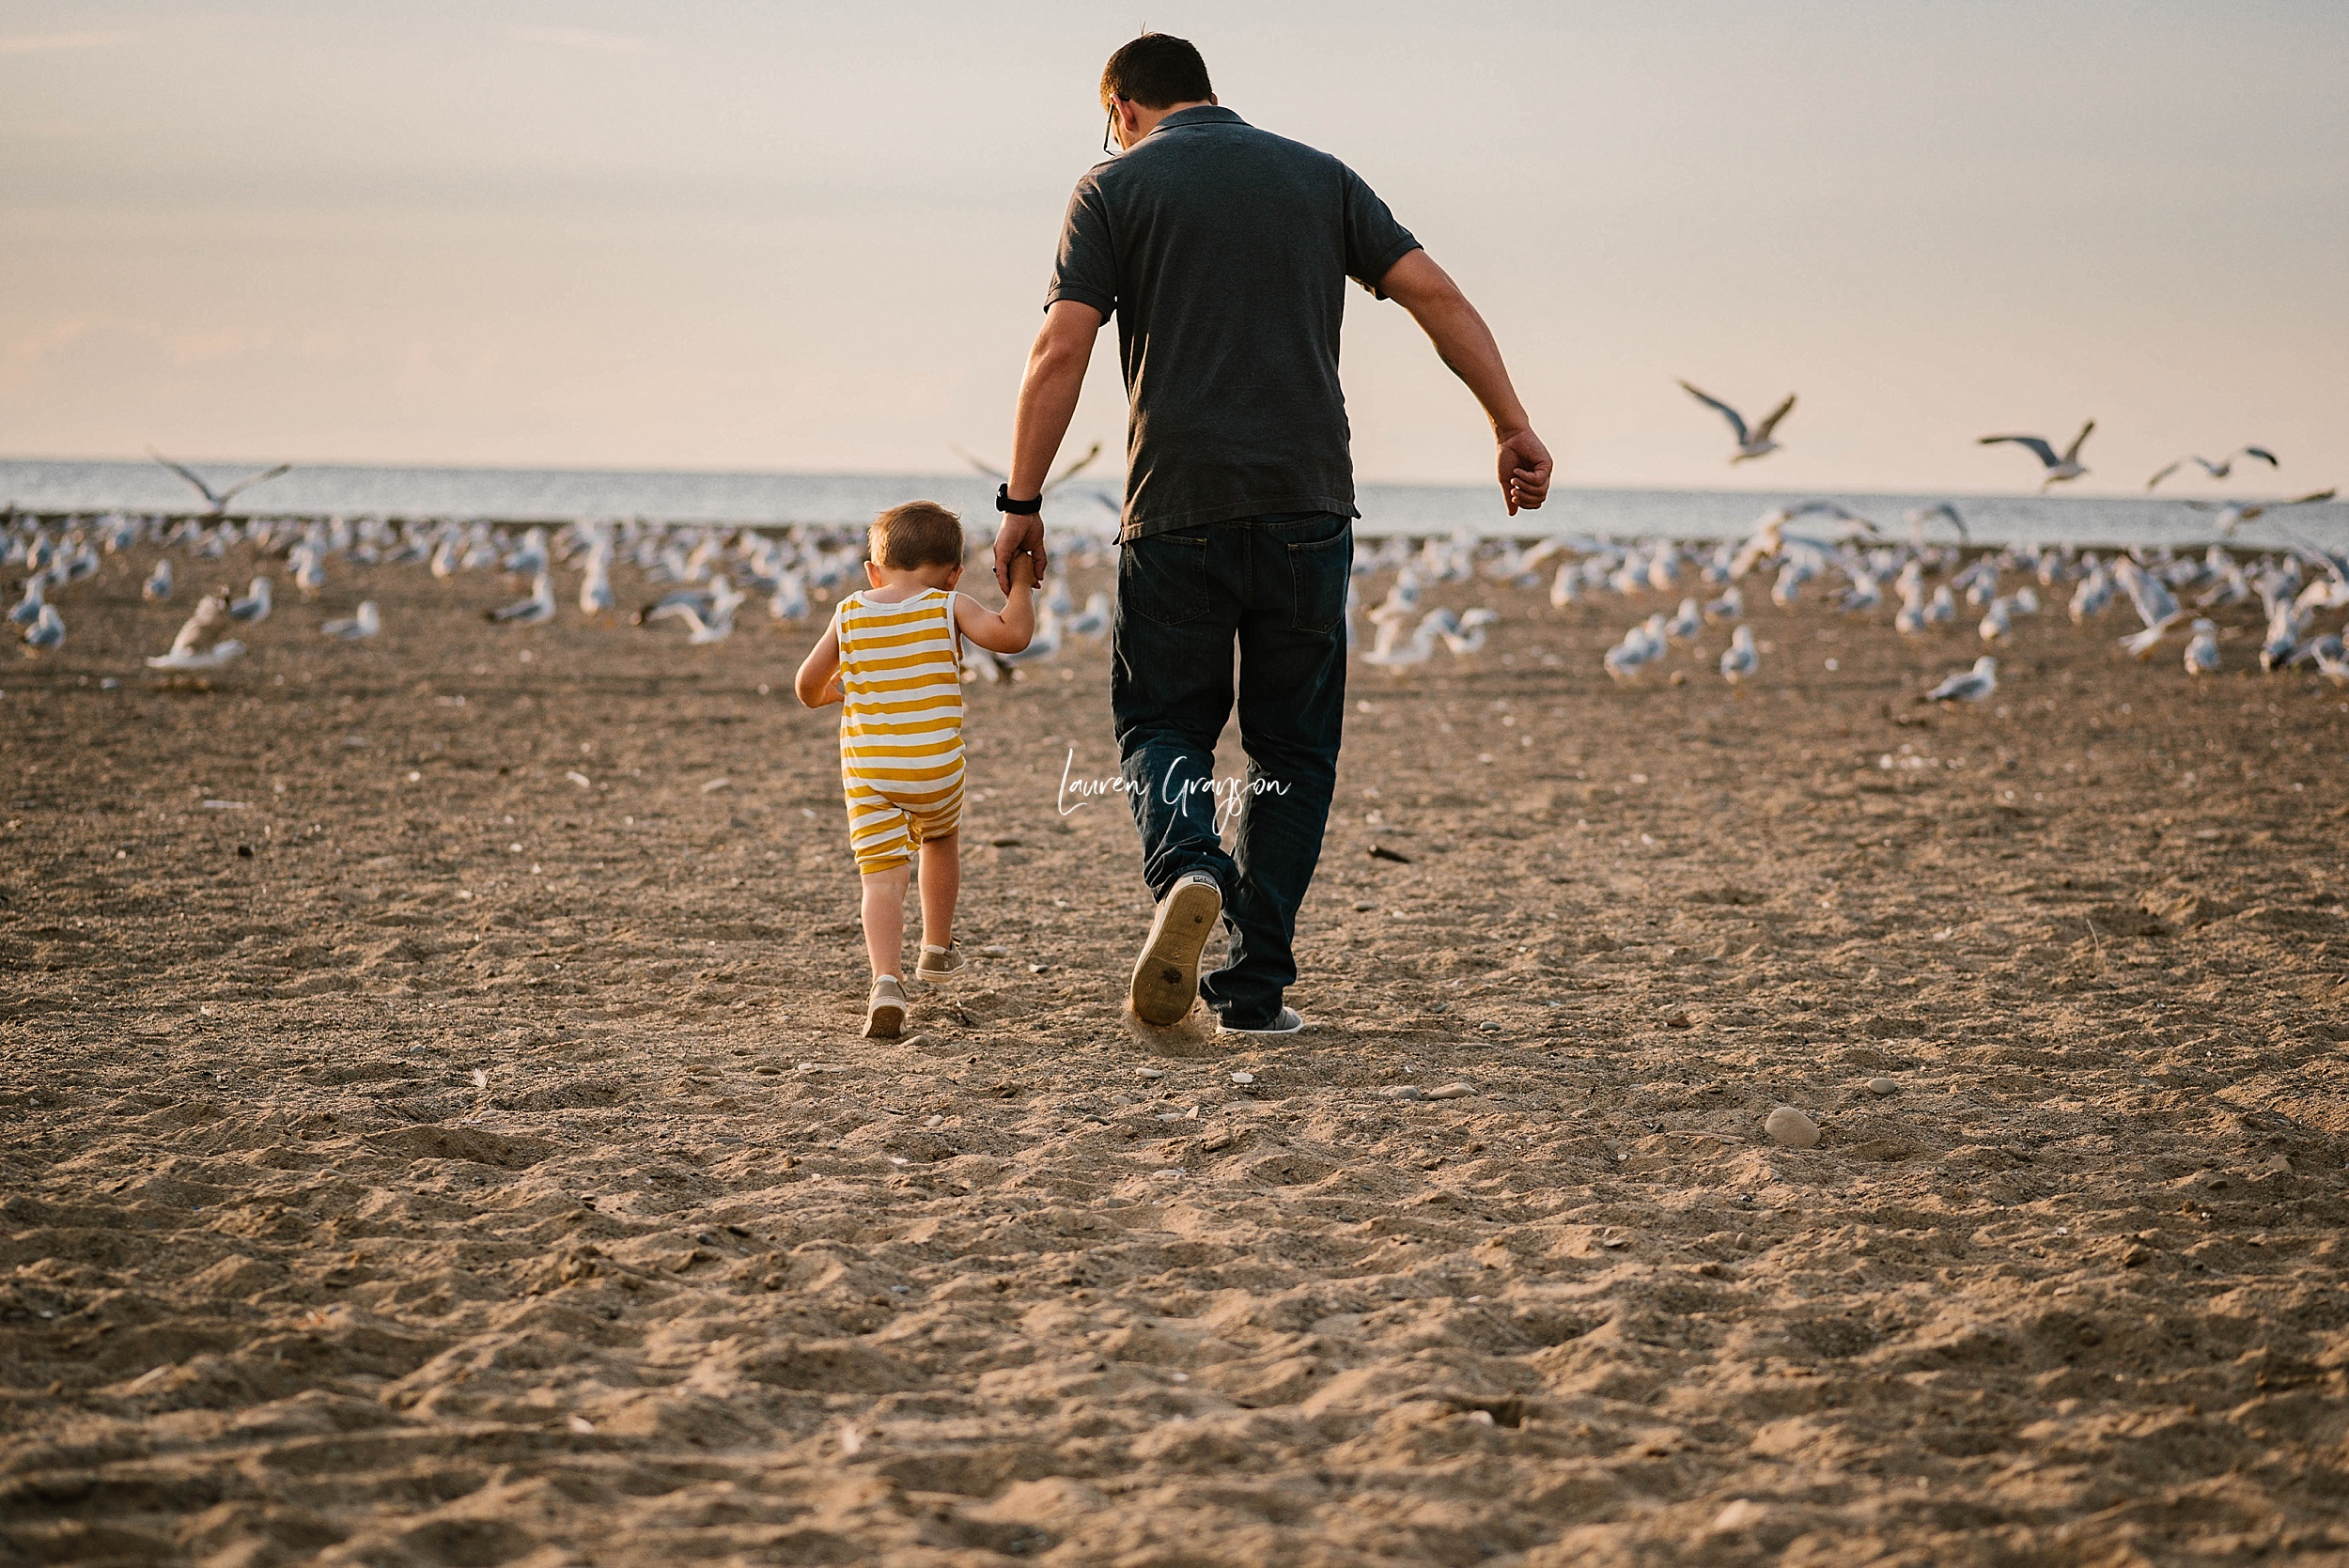 lauren-grayson-photography-cleveland-ohio-photographer-mentor-headlands-beach-maternity-session-2018_0761.jpg